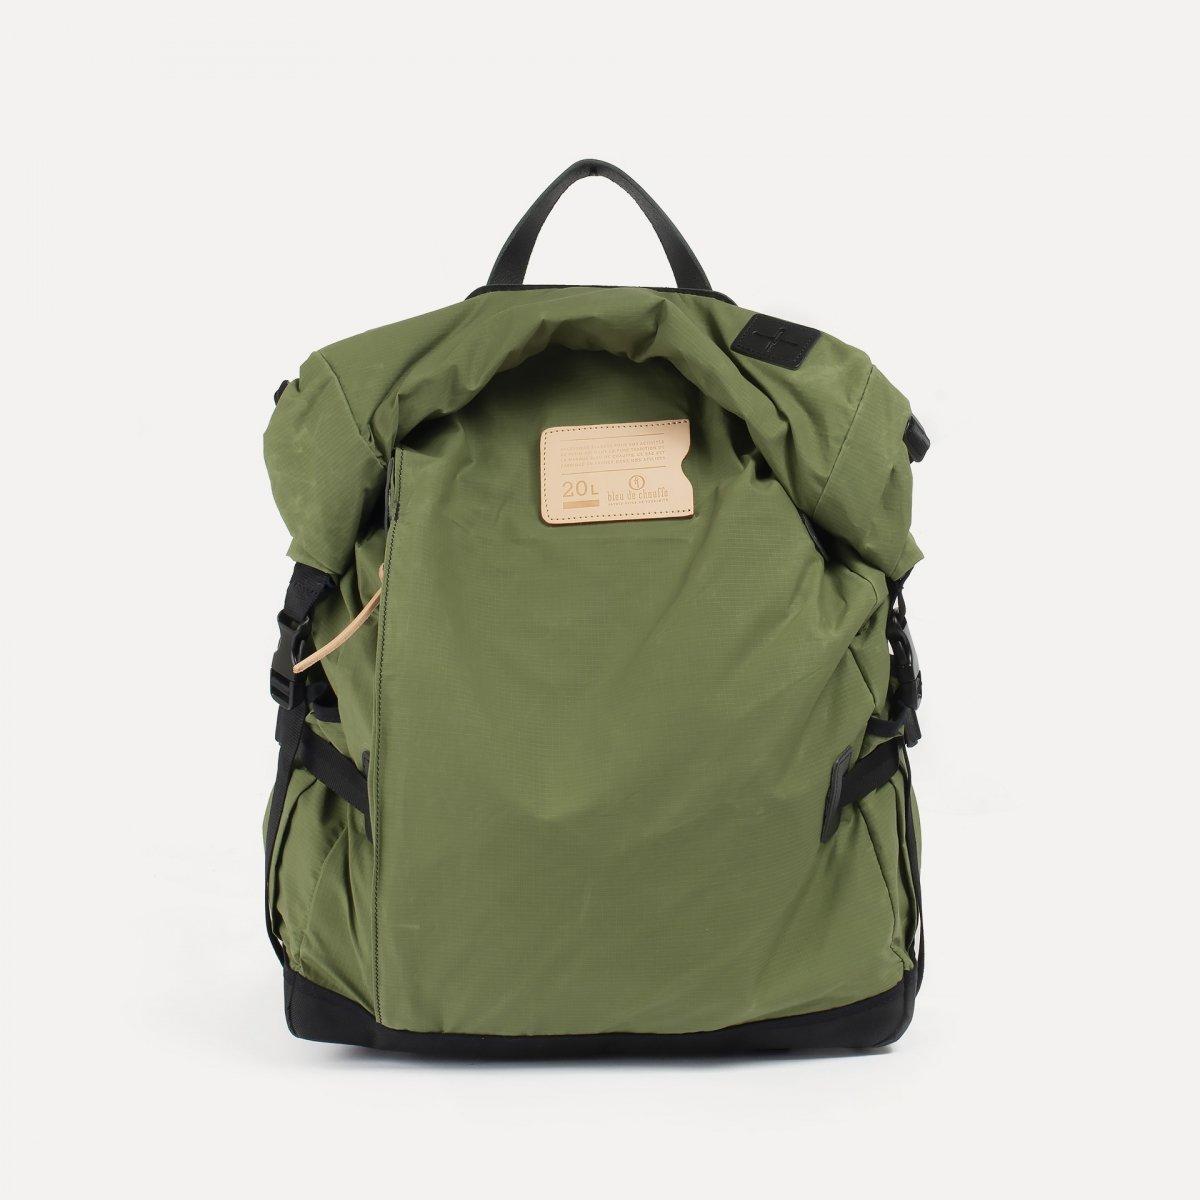 20L Basile Backpack - Bancha Green (image n°1)